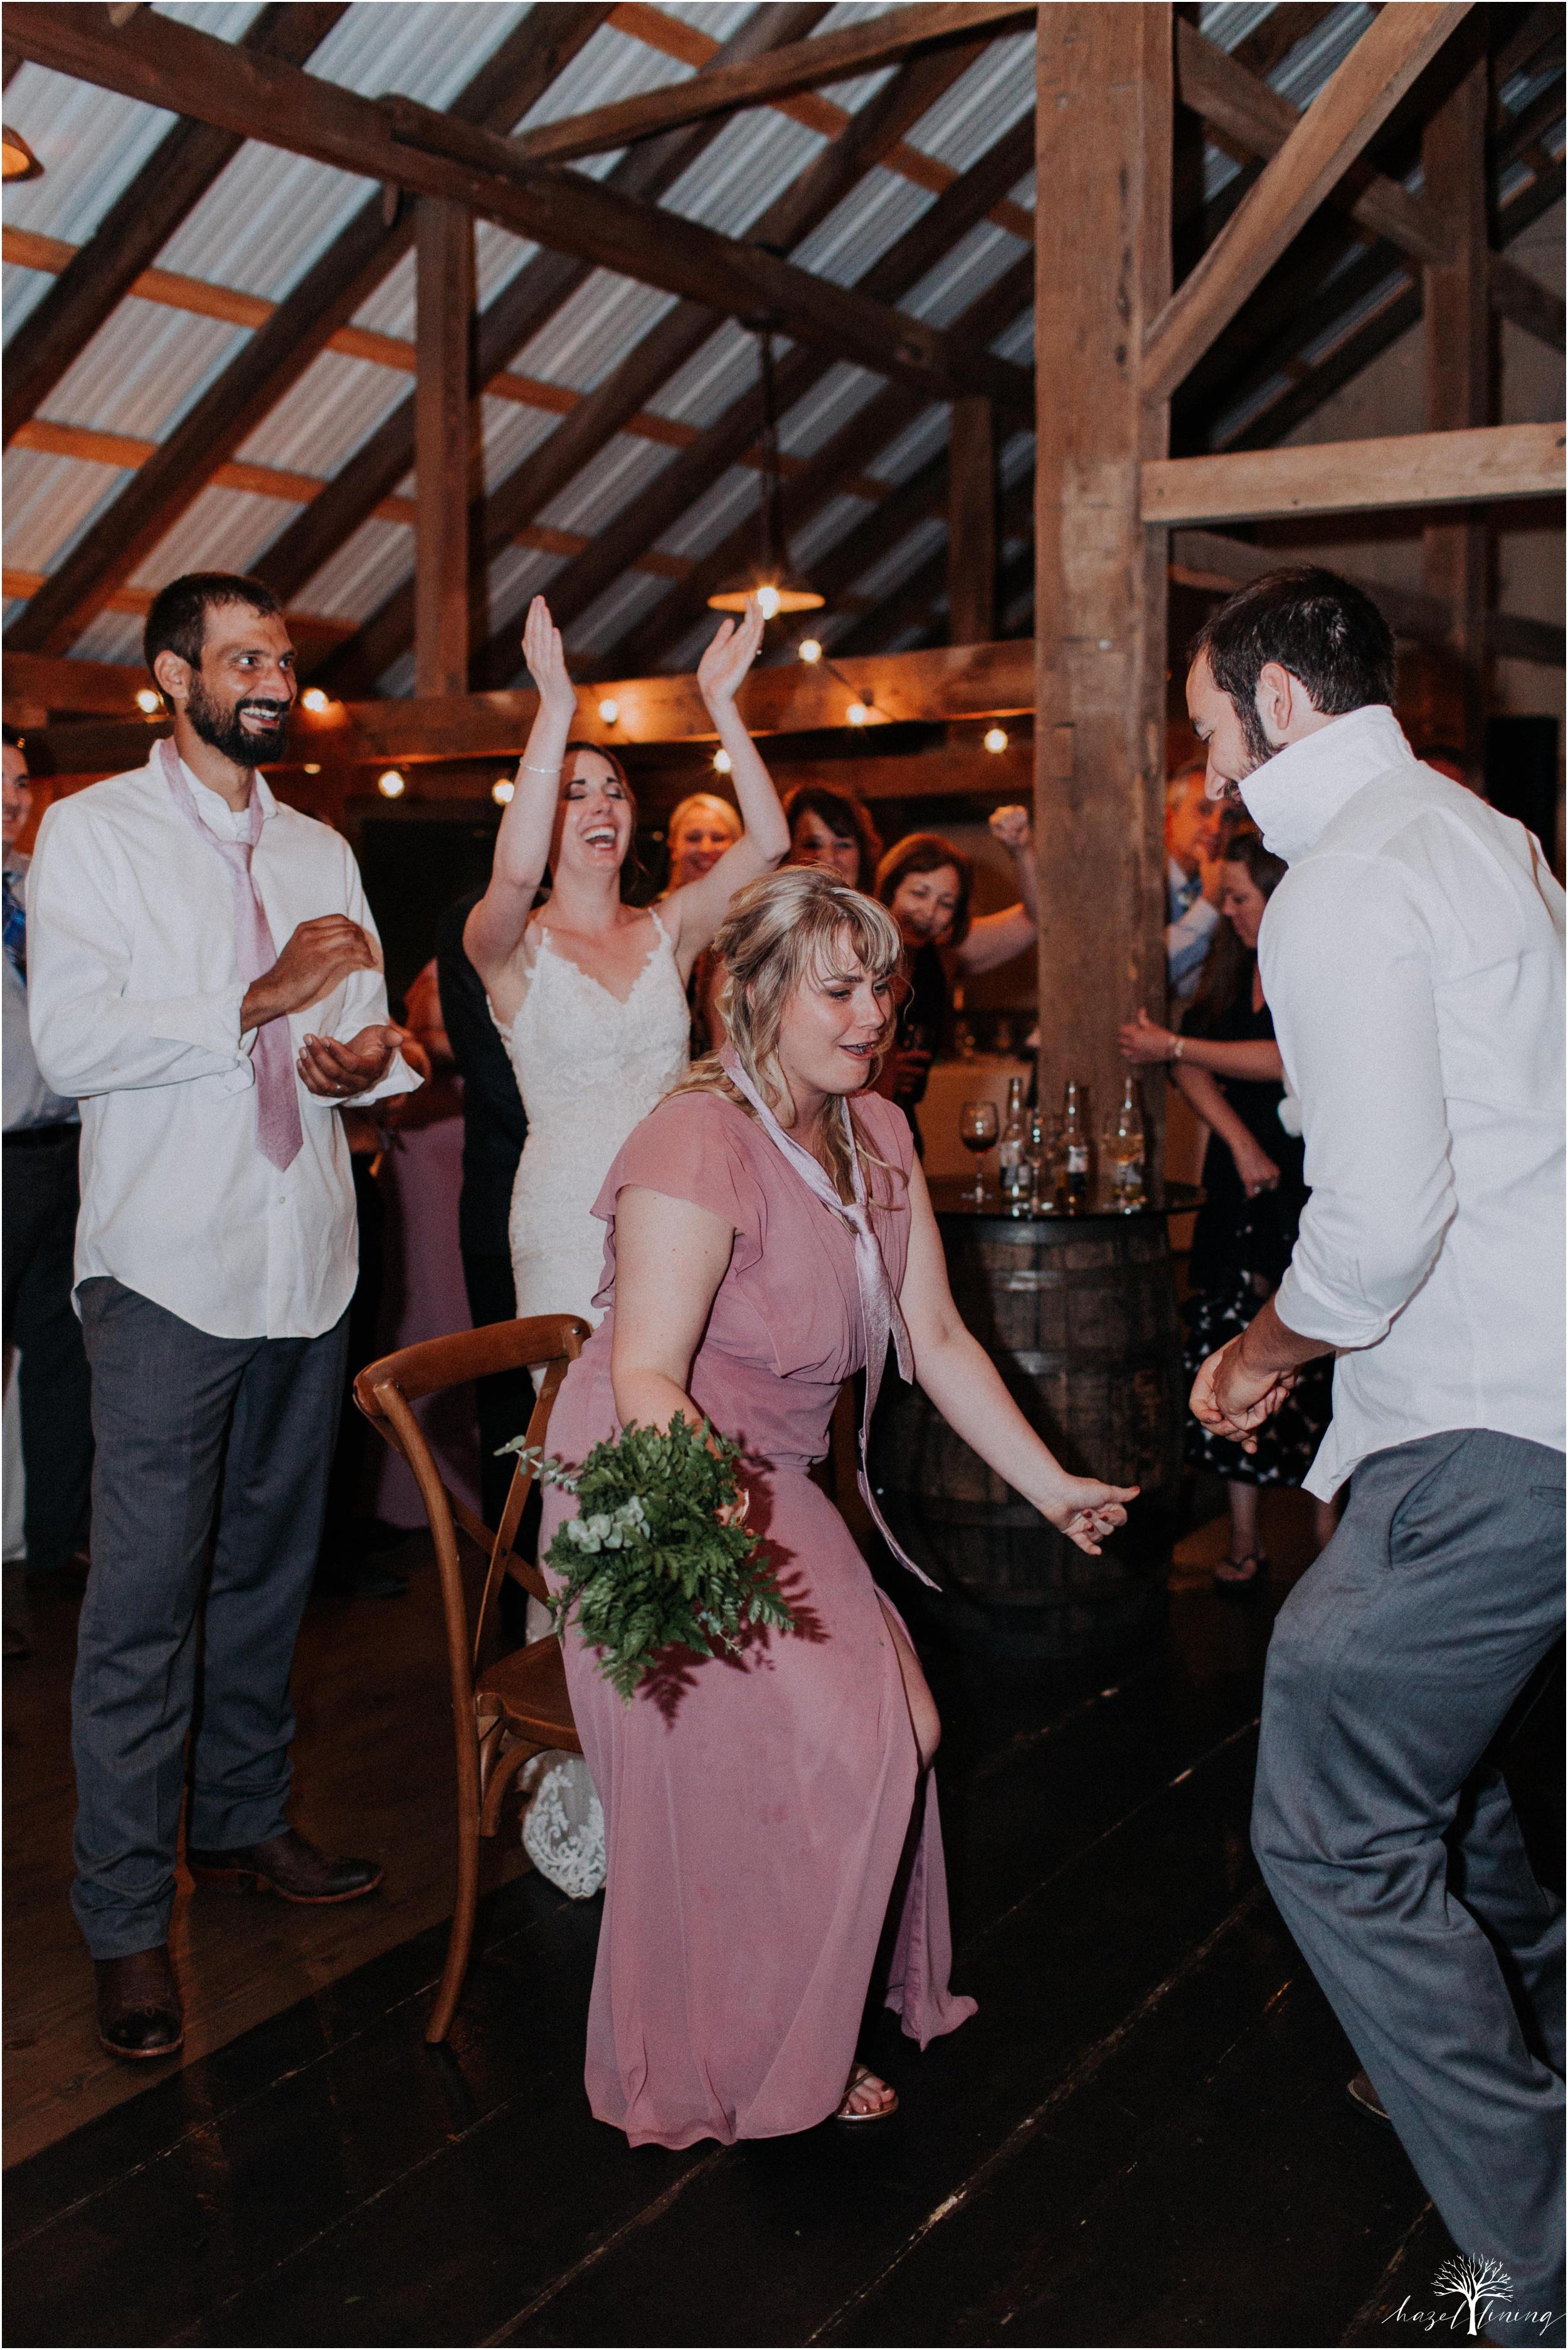 hazel-lining-travel-wedding-elopement-photography-lisa-landon-shoemaker-the-farm-bakery-and-events-bucks-county-quakertown-pennsylvania-summer-country-outdoor-farm-wedding_0171.jpg